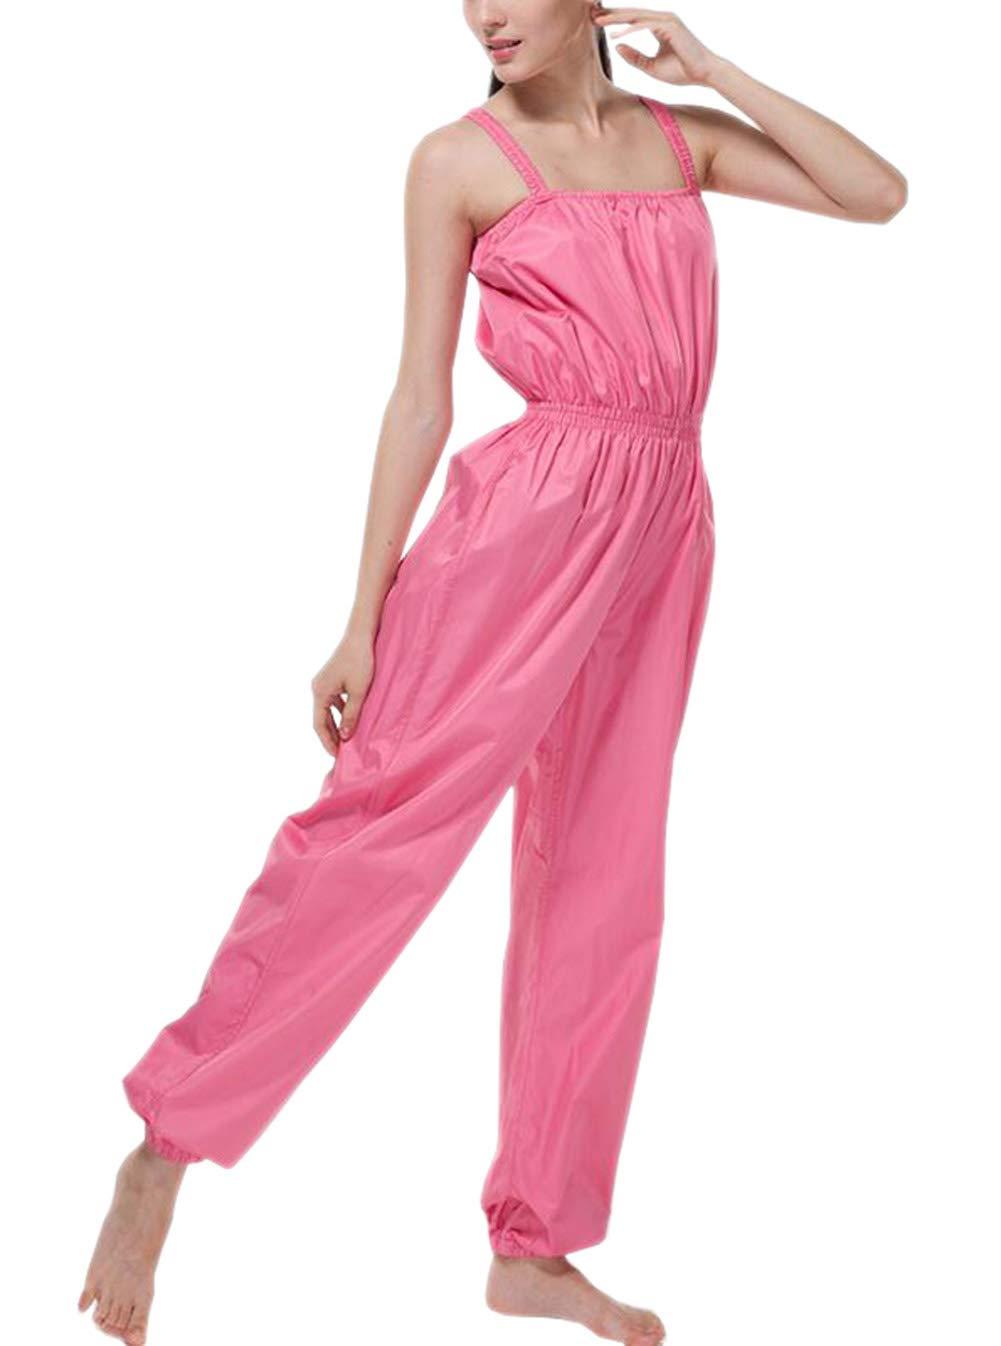 Women 's Professional損失重量スーツワンピースSweat Suit Enhanced Sauna Suit with内側メッシュ XL: waist:25.59\ フクシャ B00KXW7F08